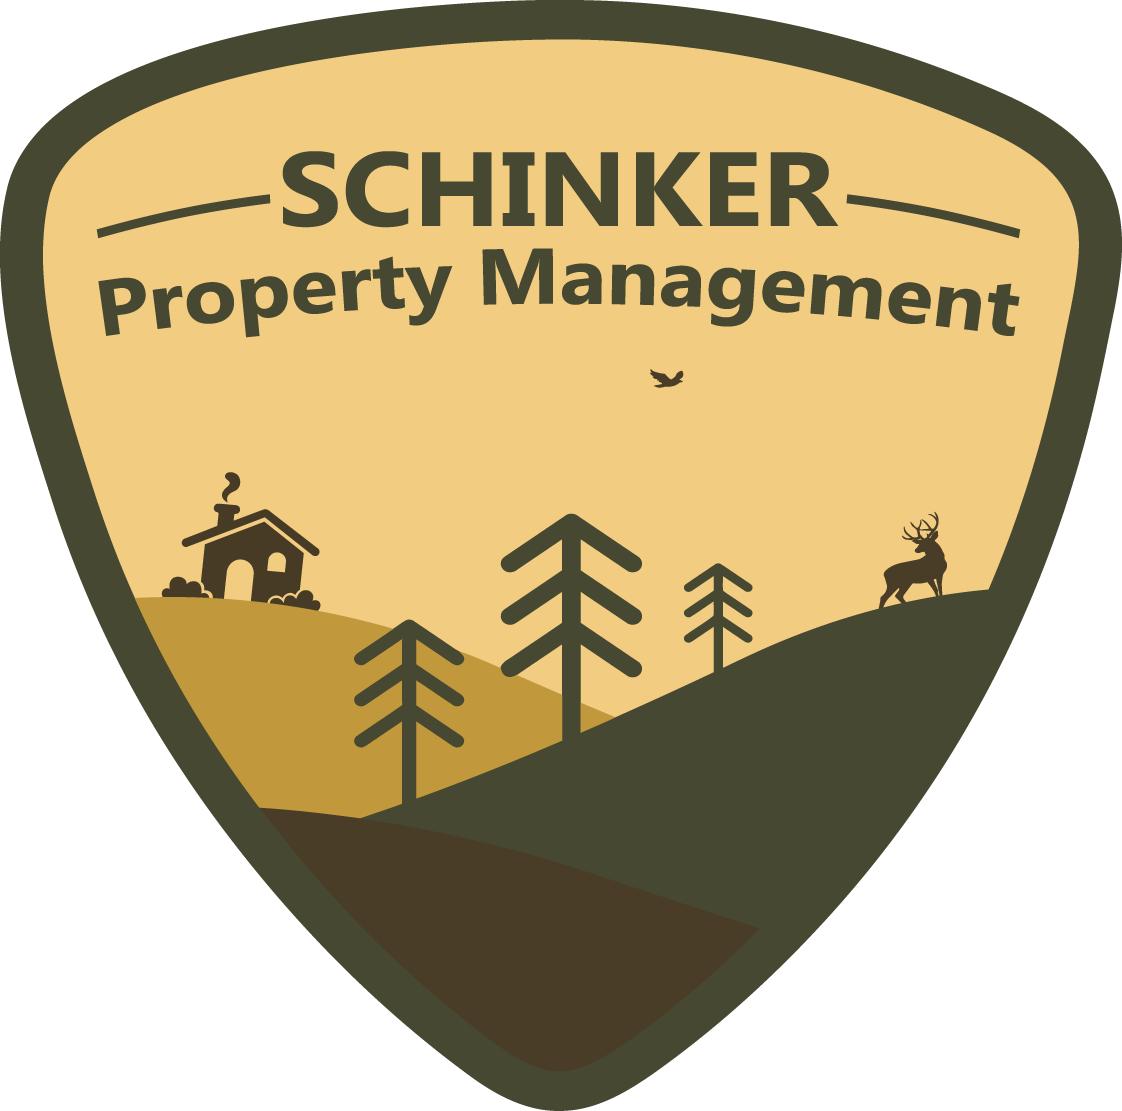 Schinker Property Management image